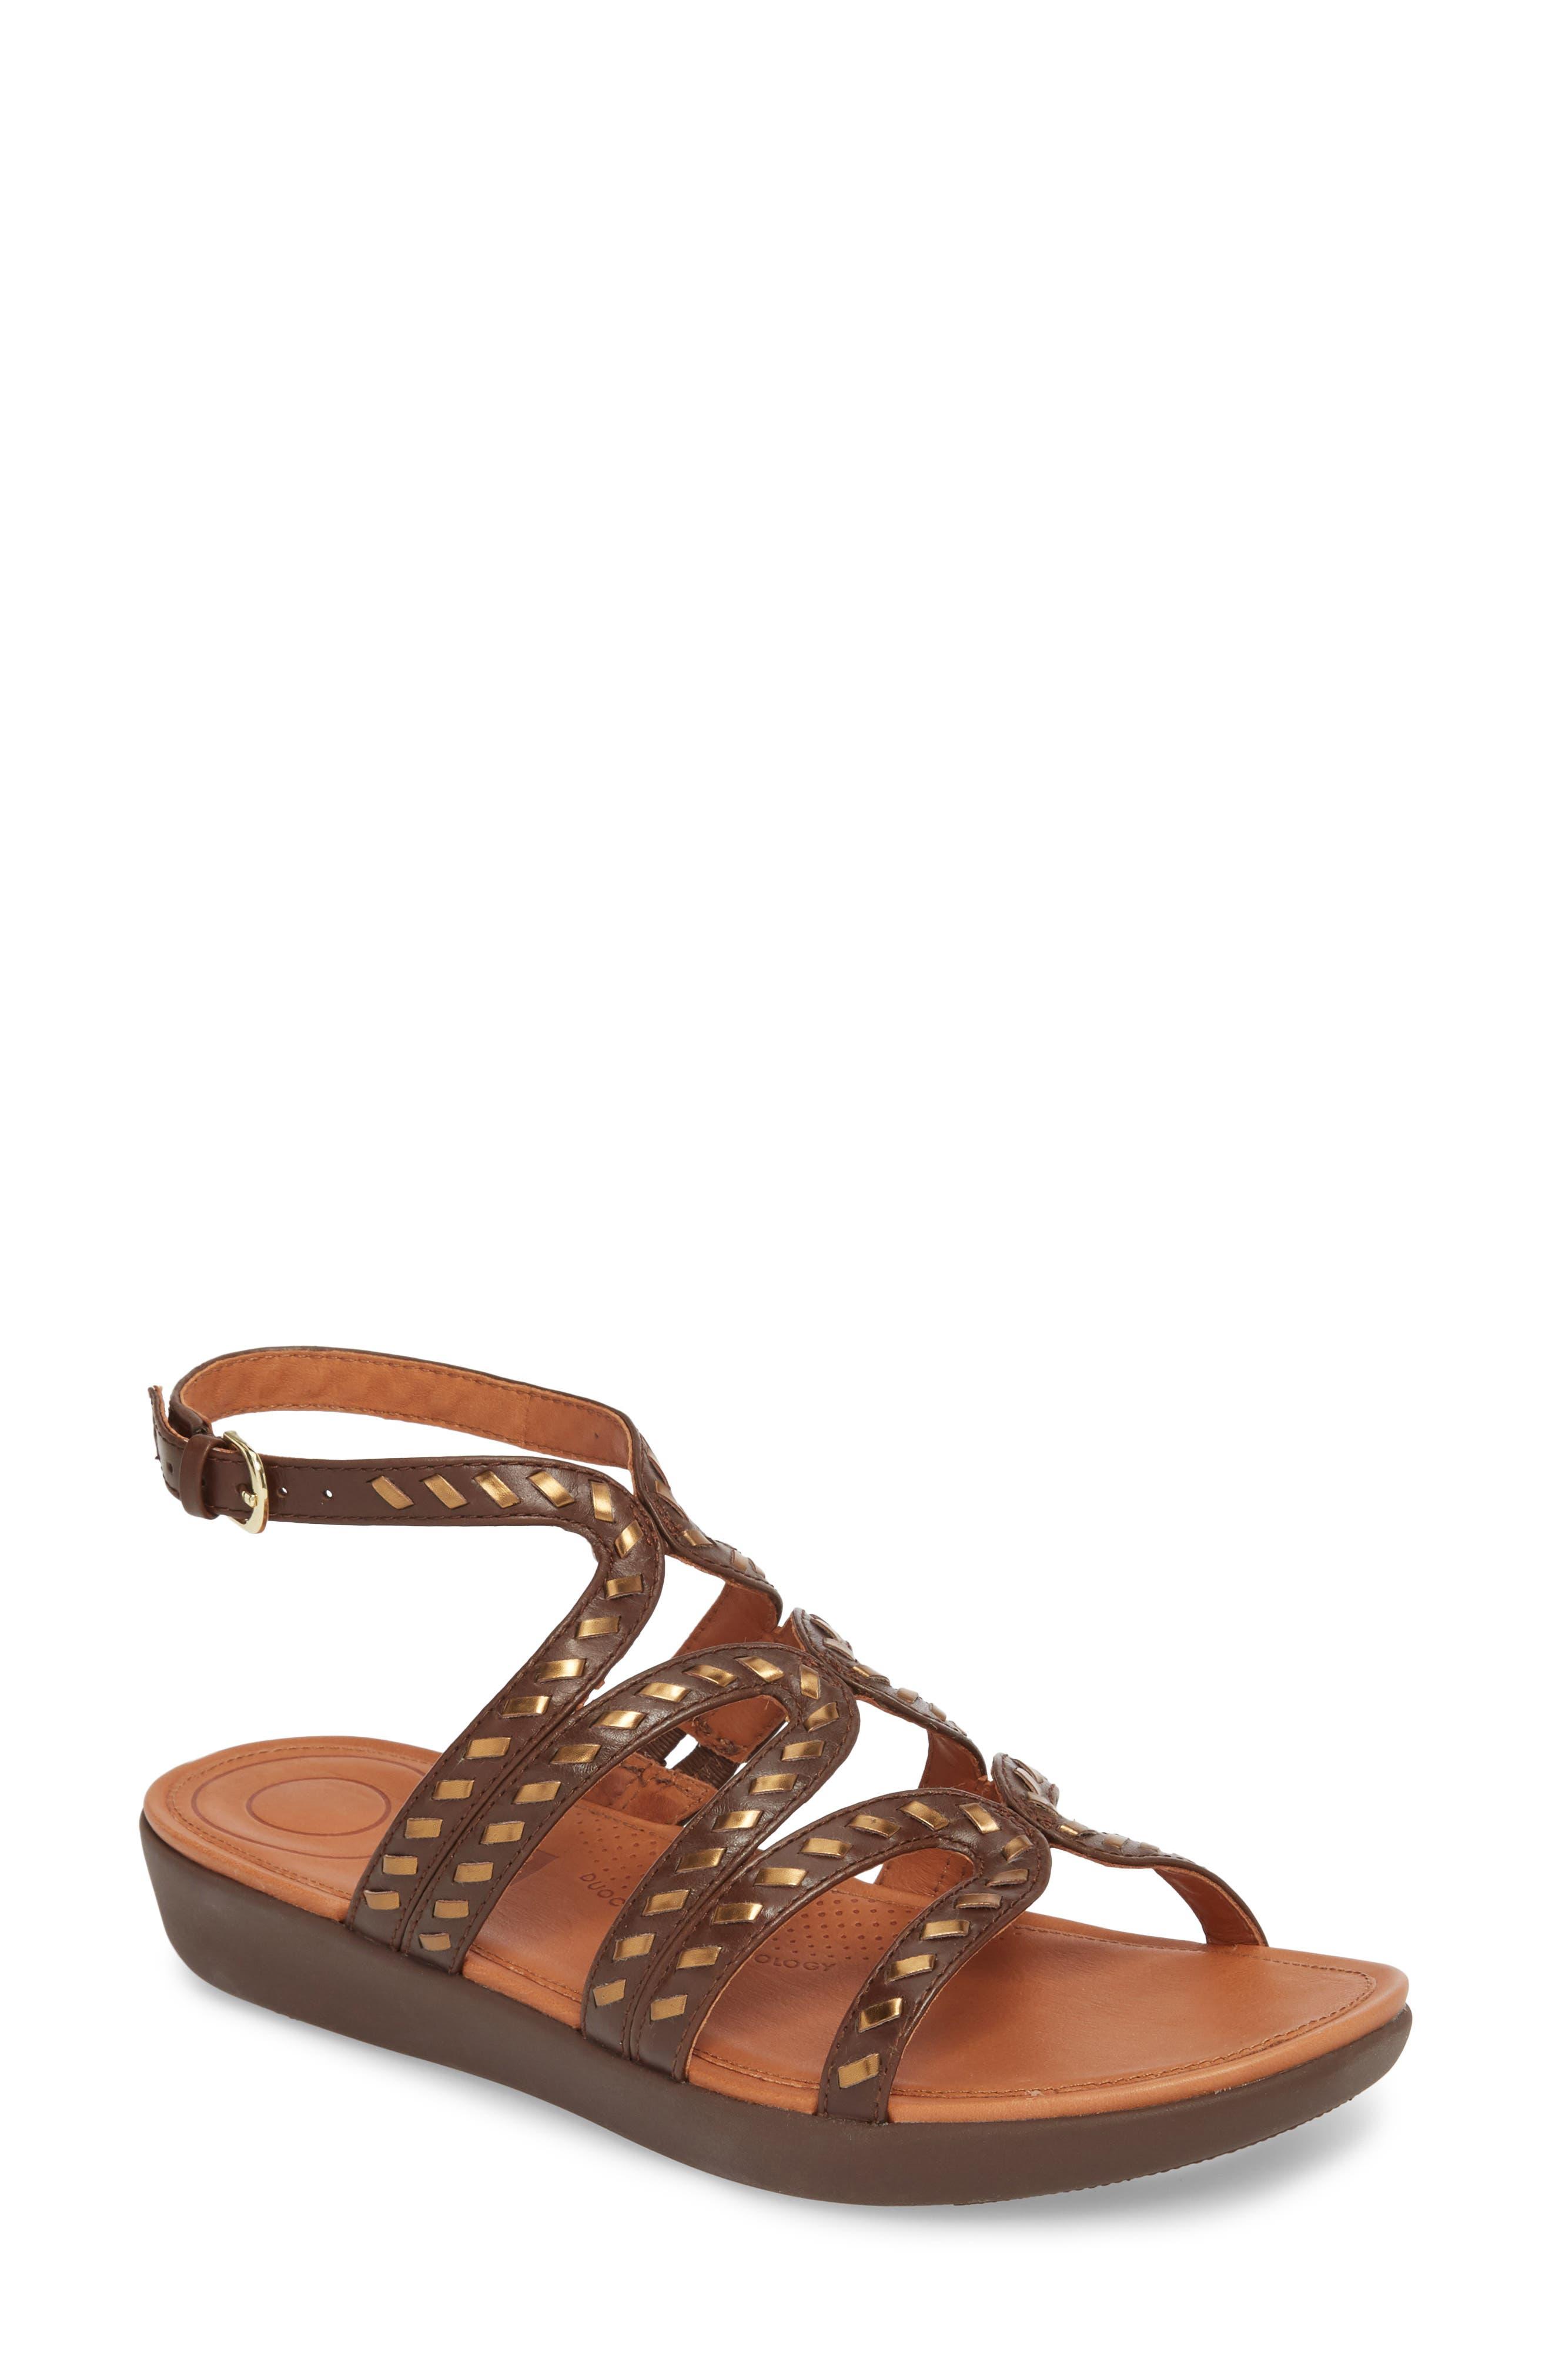 Strata Gladiator Sandal,                         Main,                         color, 200